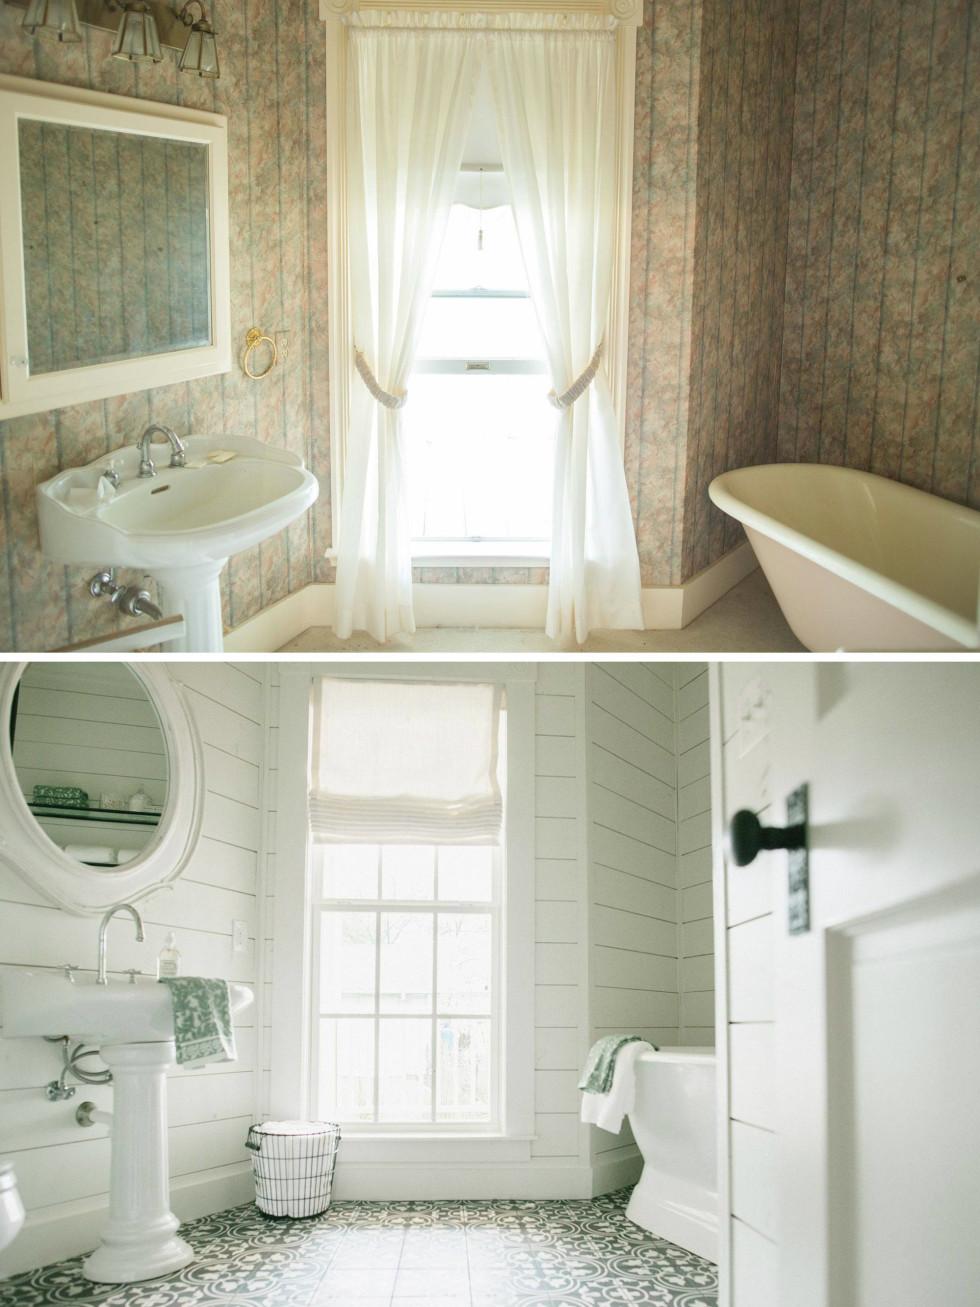 Magnolia House bathroom